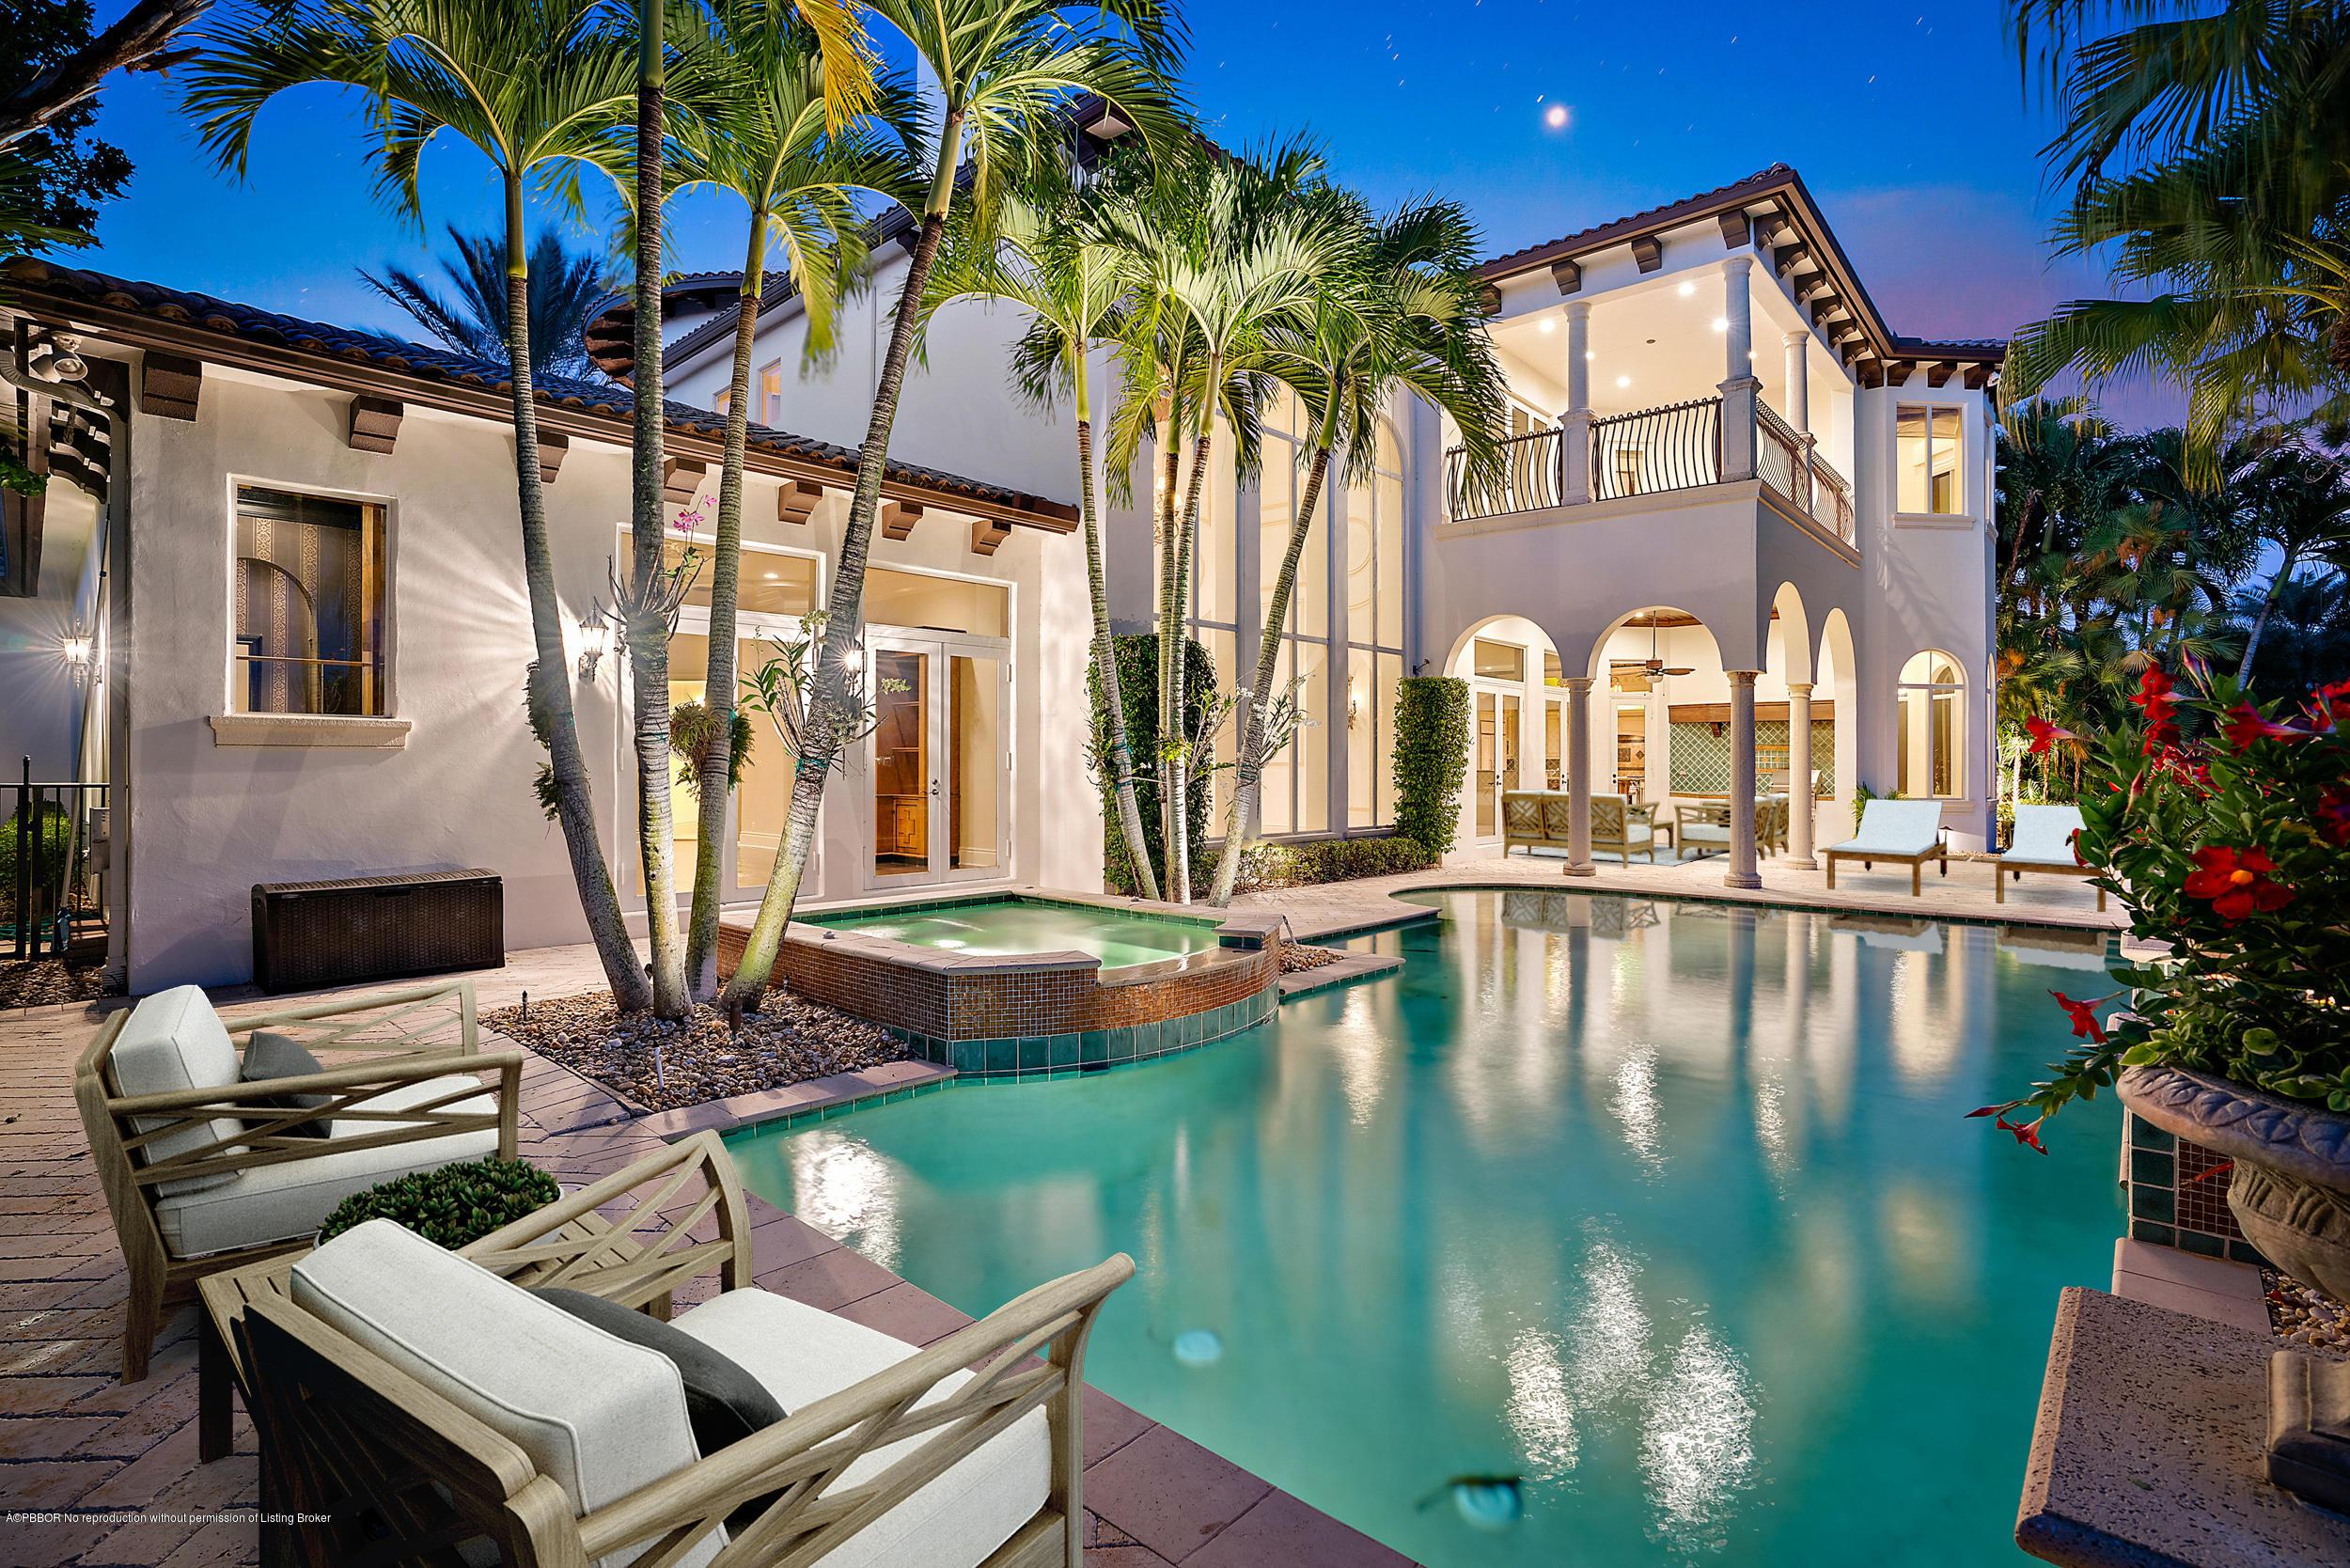 110 Playa Rienta Way - Palm Beach Gardens, Florida